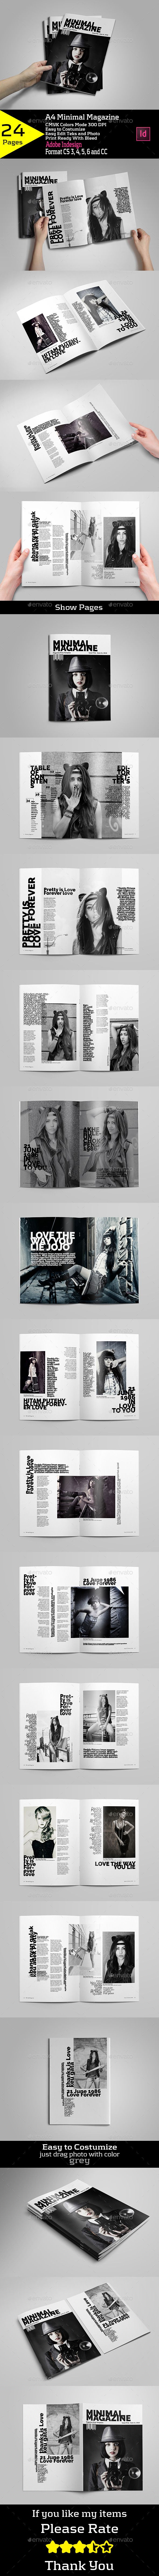 A4 Minimal Magazine Tempalte #design Download: http://graphicriver.net/item/a4-minimal-magazine/12933678?ref=ksioks